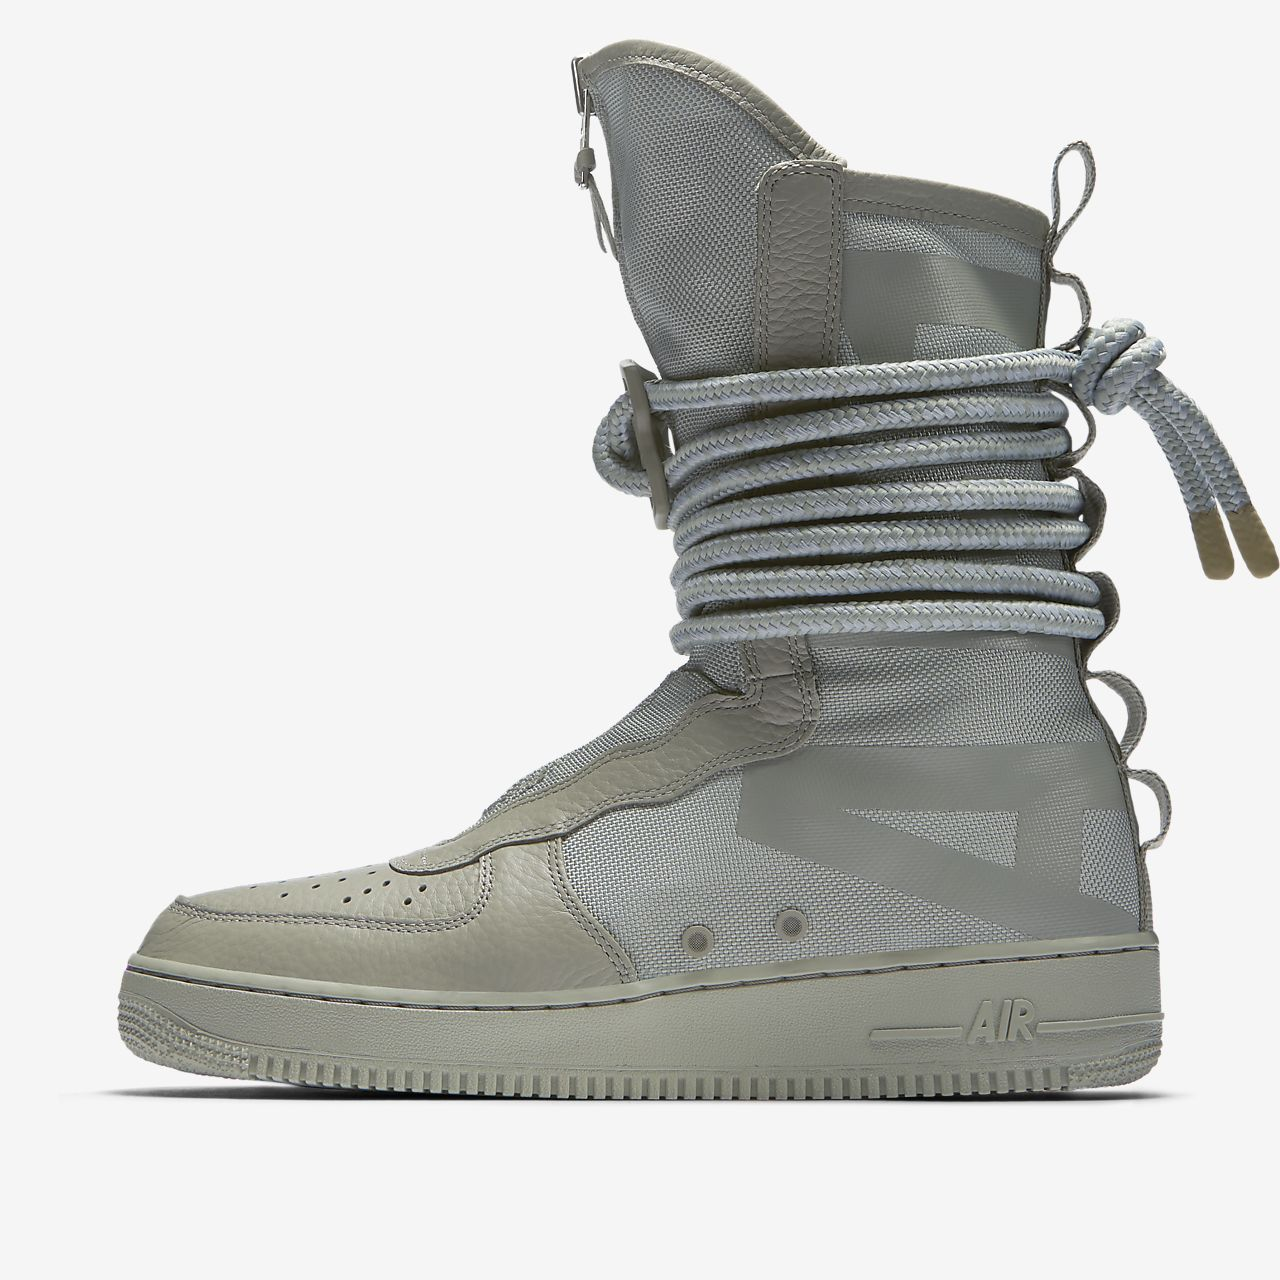 Nike SF Air Force 1 Hi boot sneakers IdU23llhsX